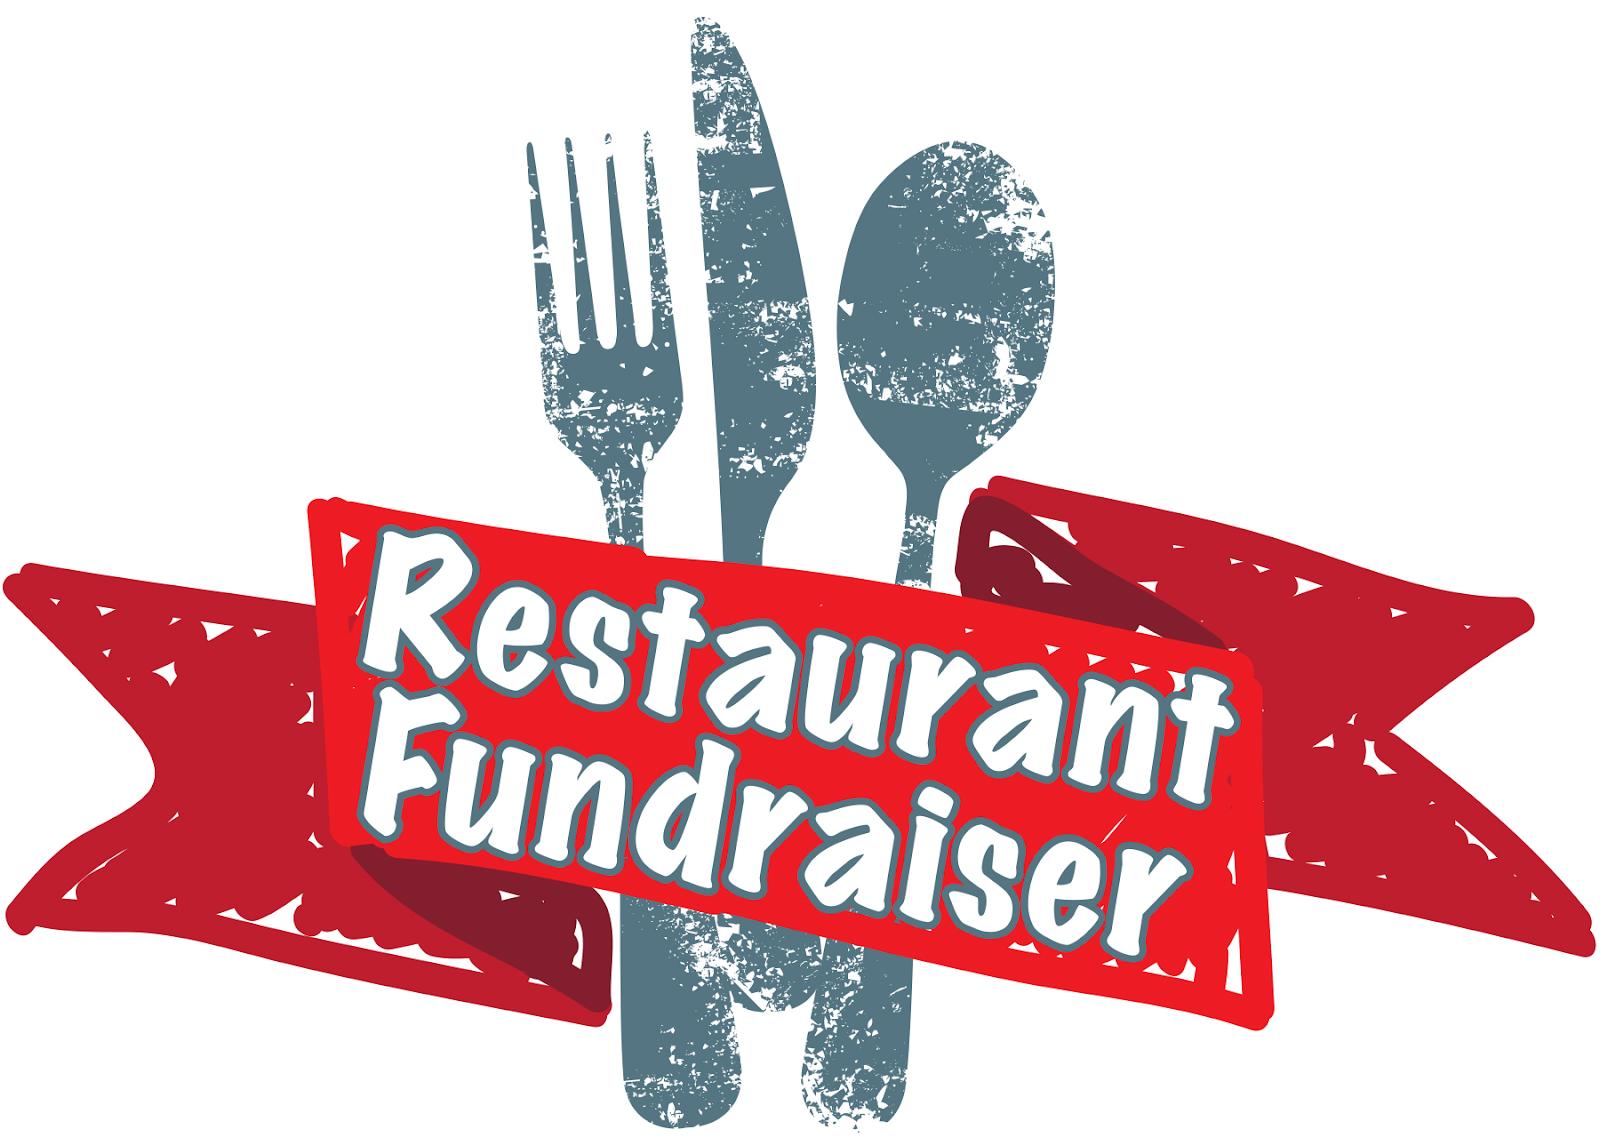 restautant fundraiser